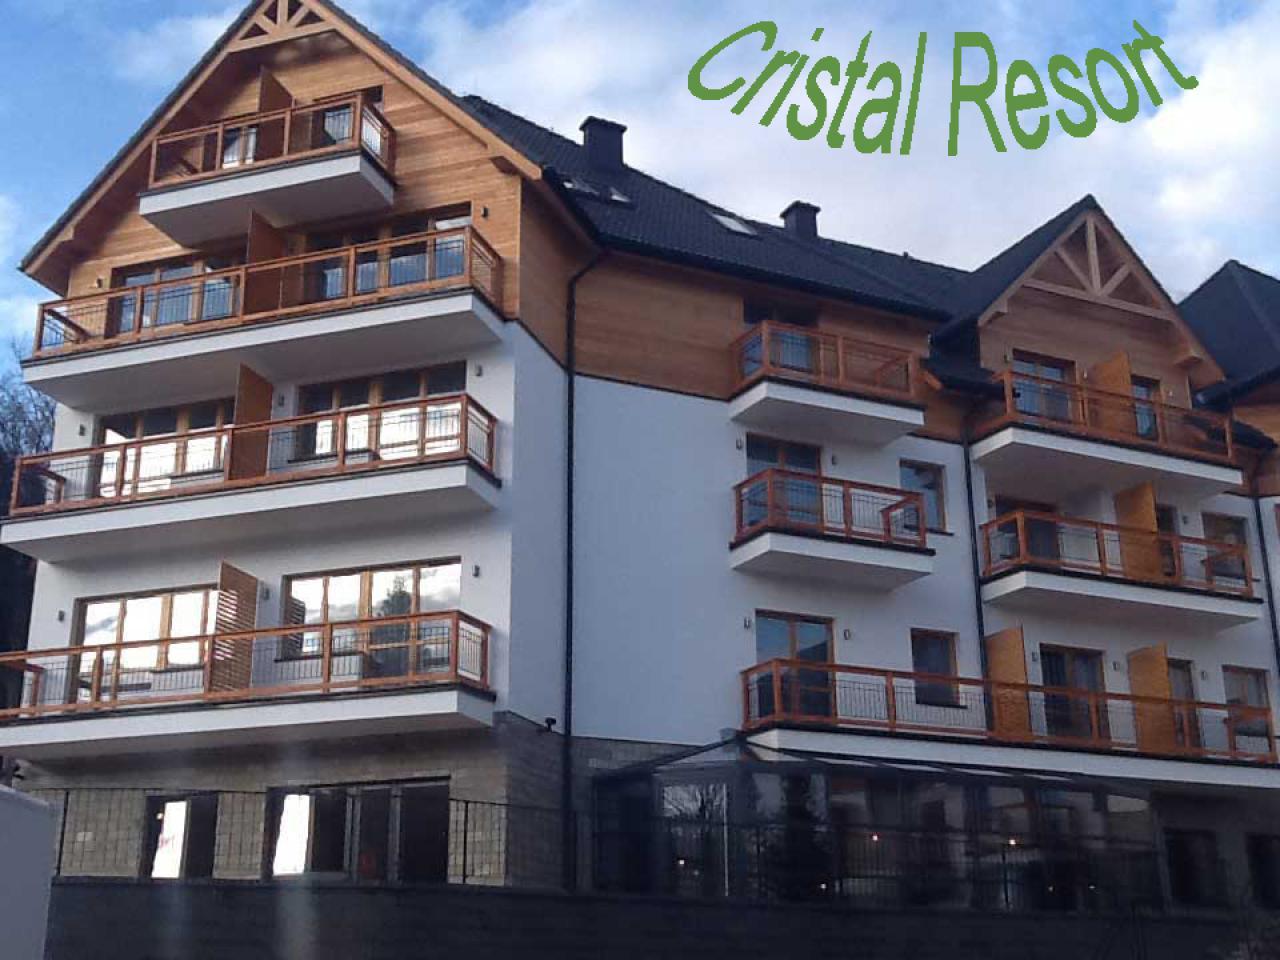 Cristal_Resort